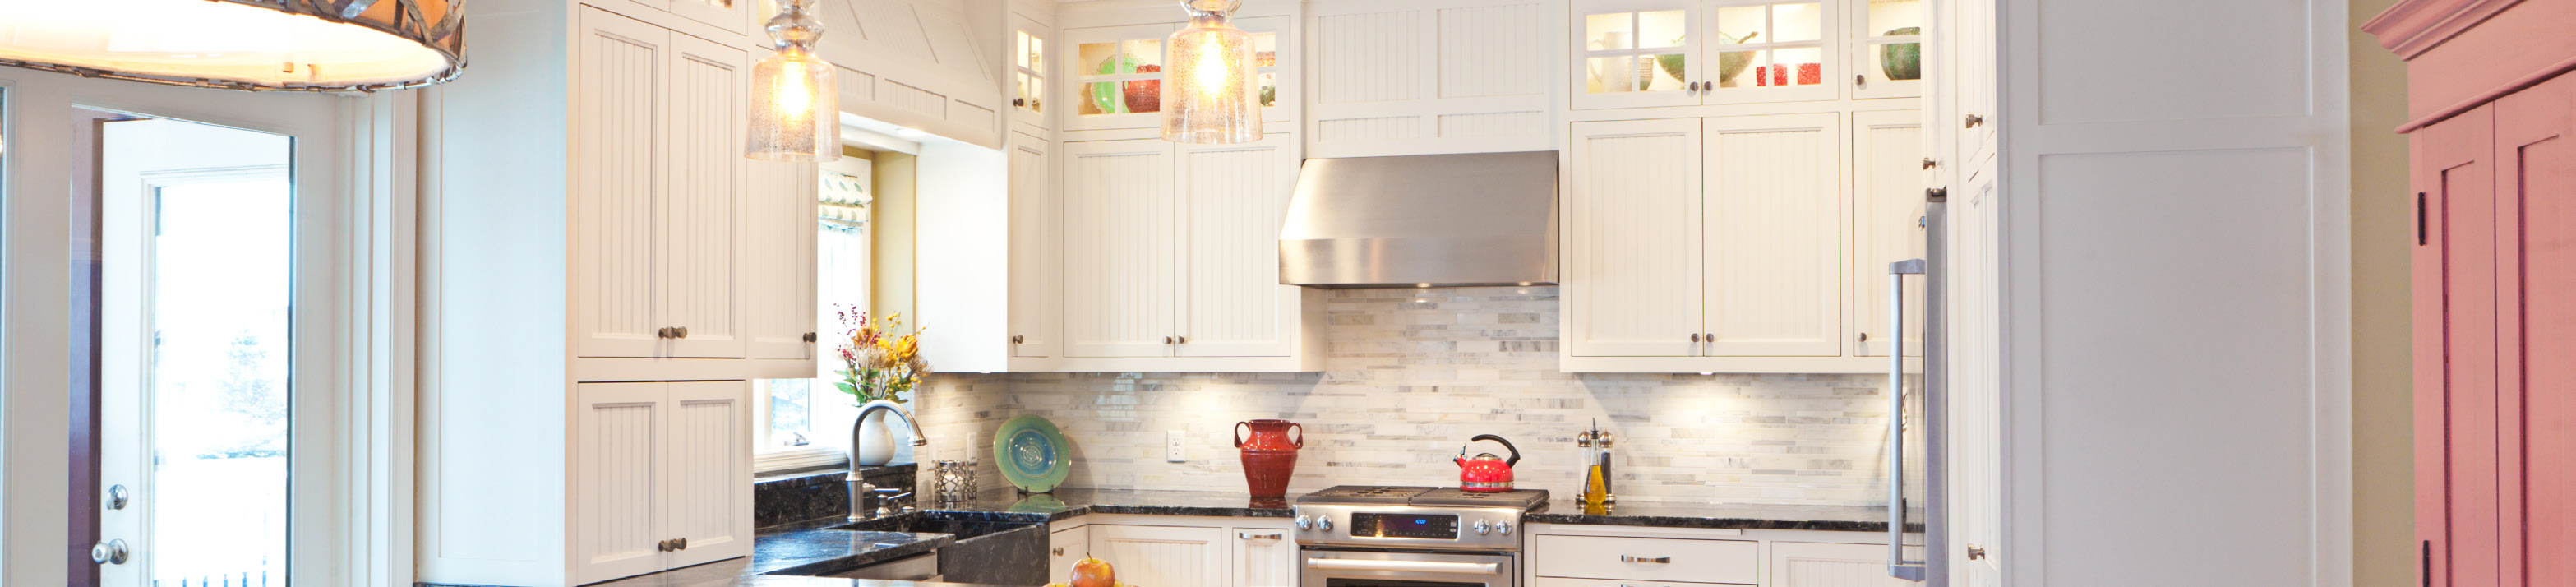 Furniture Medic of Kelowna Kitchen Cabinet Painting and Refinishing